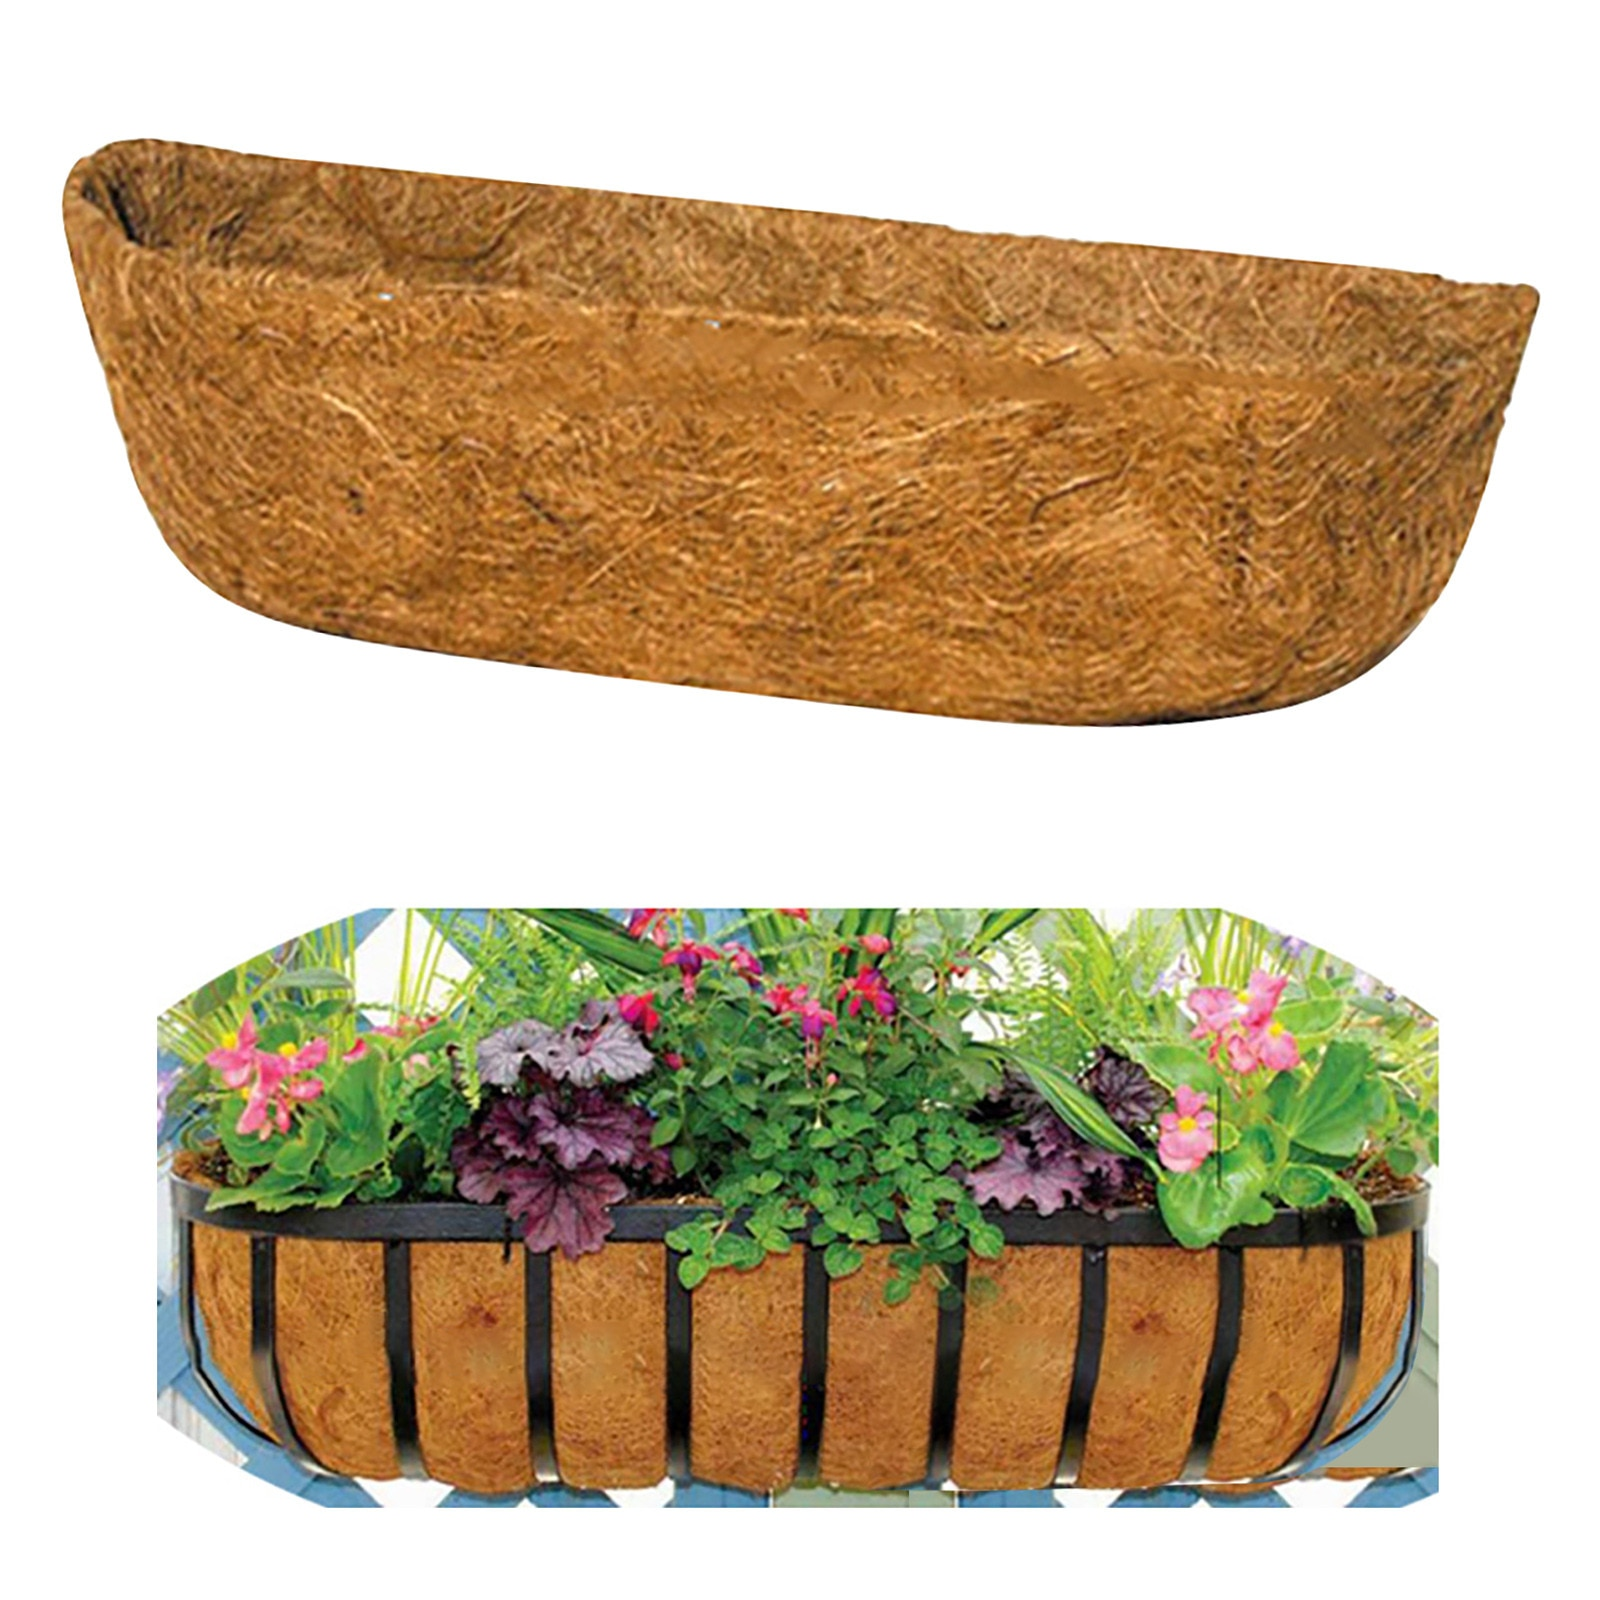 Flower Pot Natural Coconut Fiber Trough Planter Liner For Window Box Family Garden Wedding Decoration Flower Basket Decor